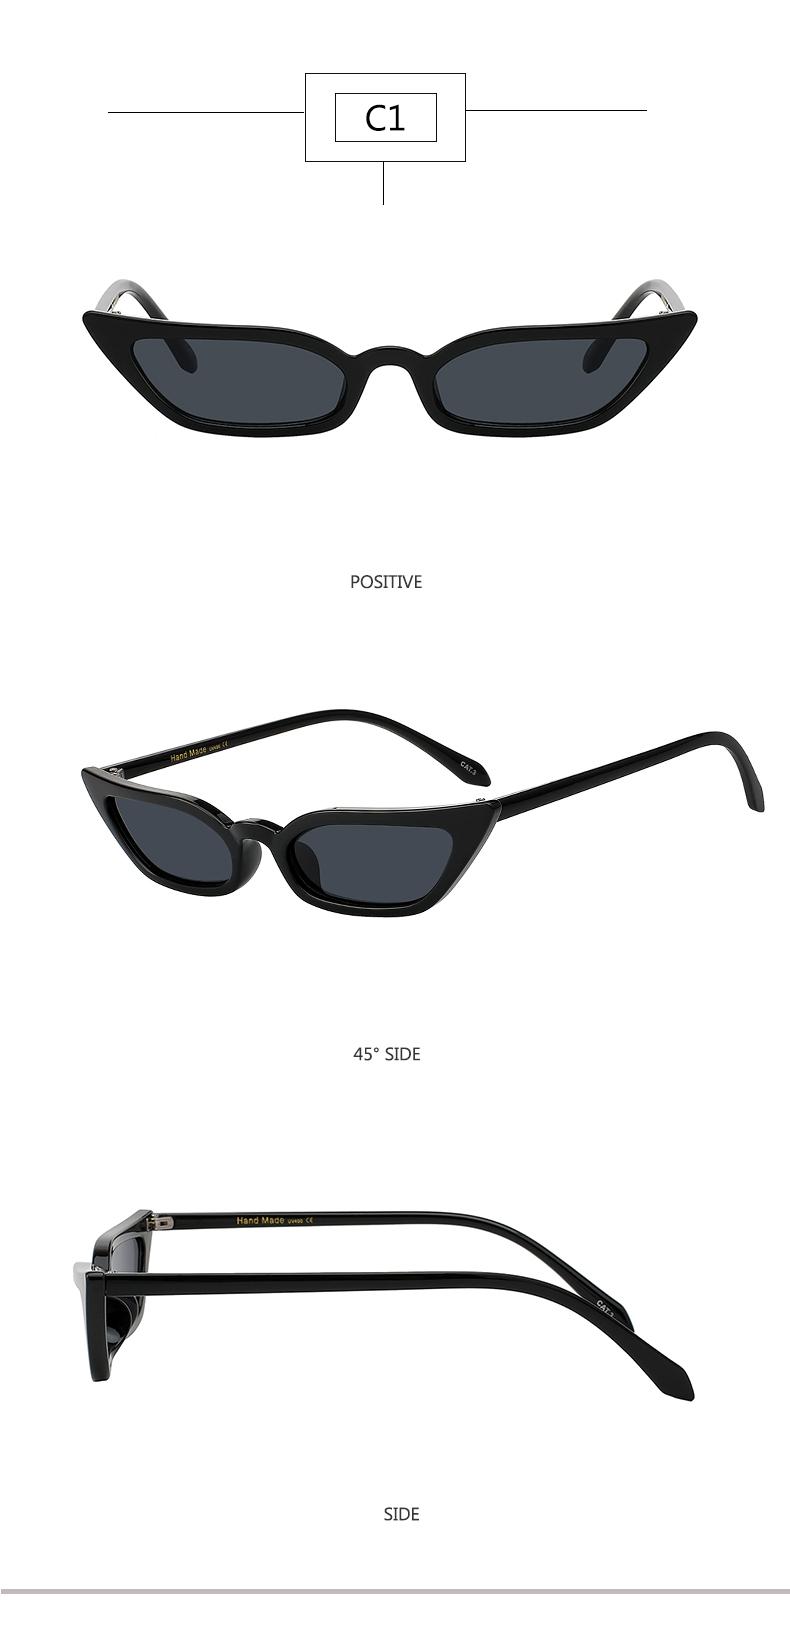 6122e80d79d8c Cat Eye Sunglasses Women Fashion Vintage Small Lense Eyeglasses ...